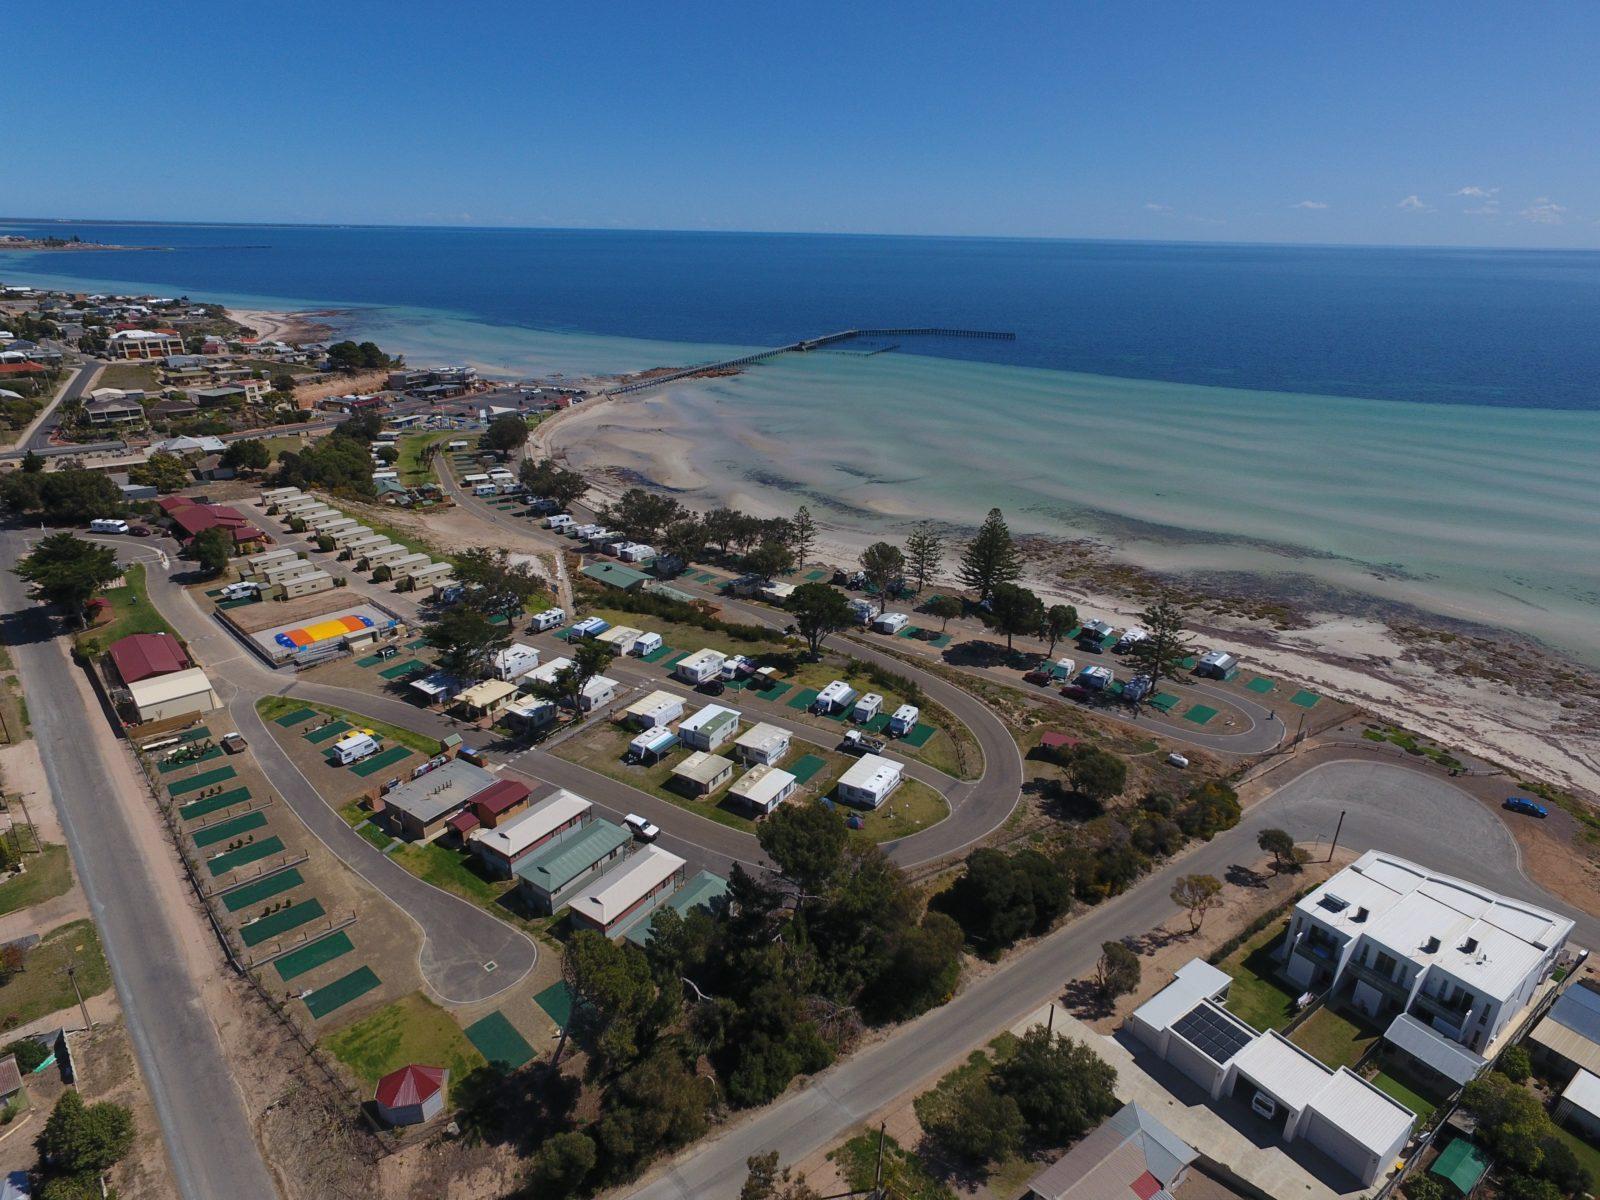 Moonta Bay Caravan Park from Above